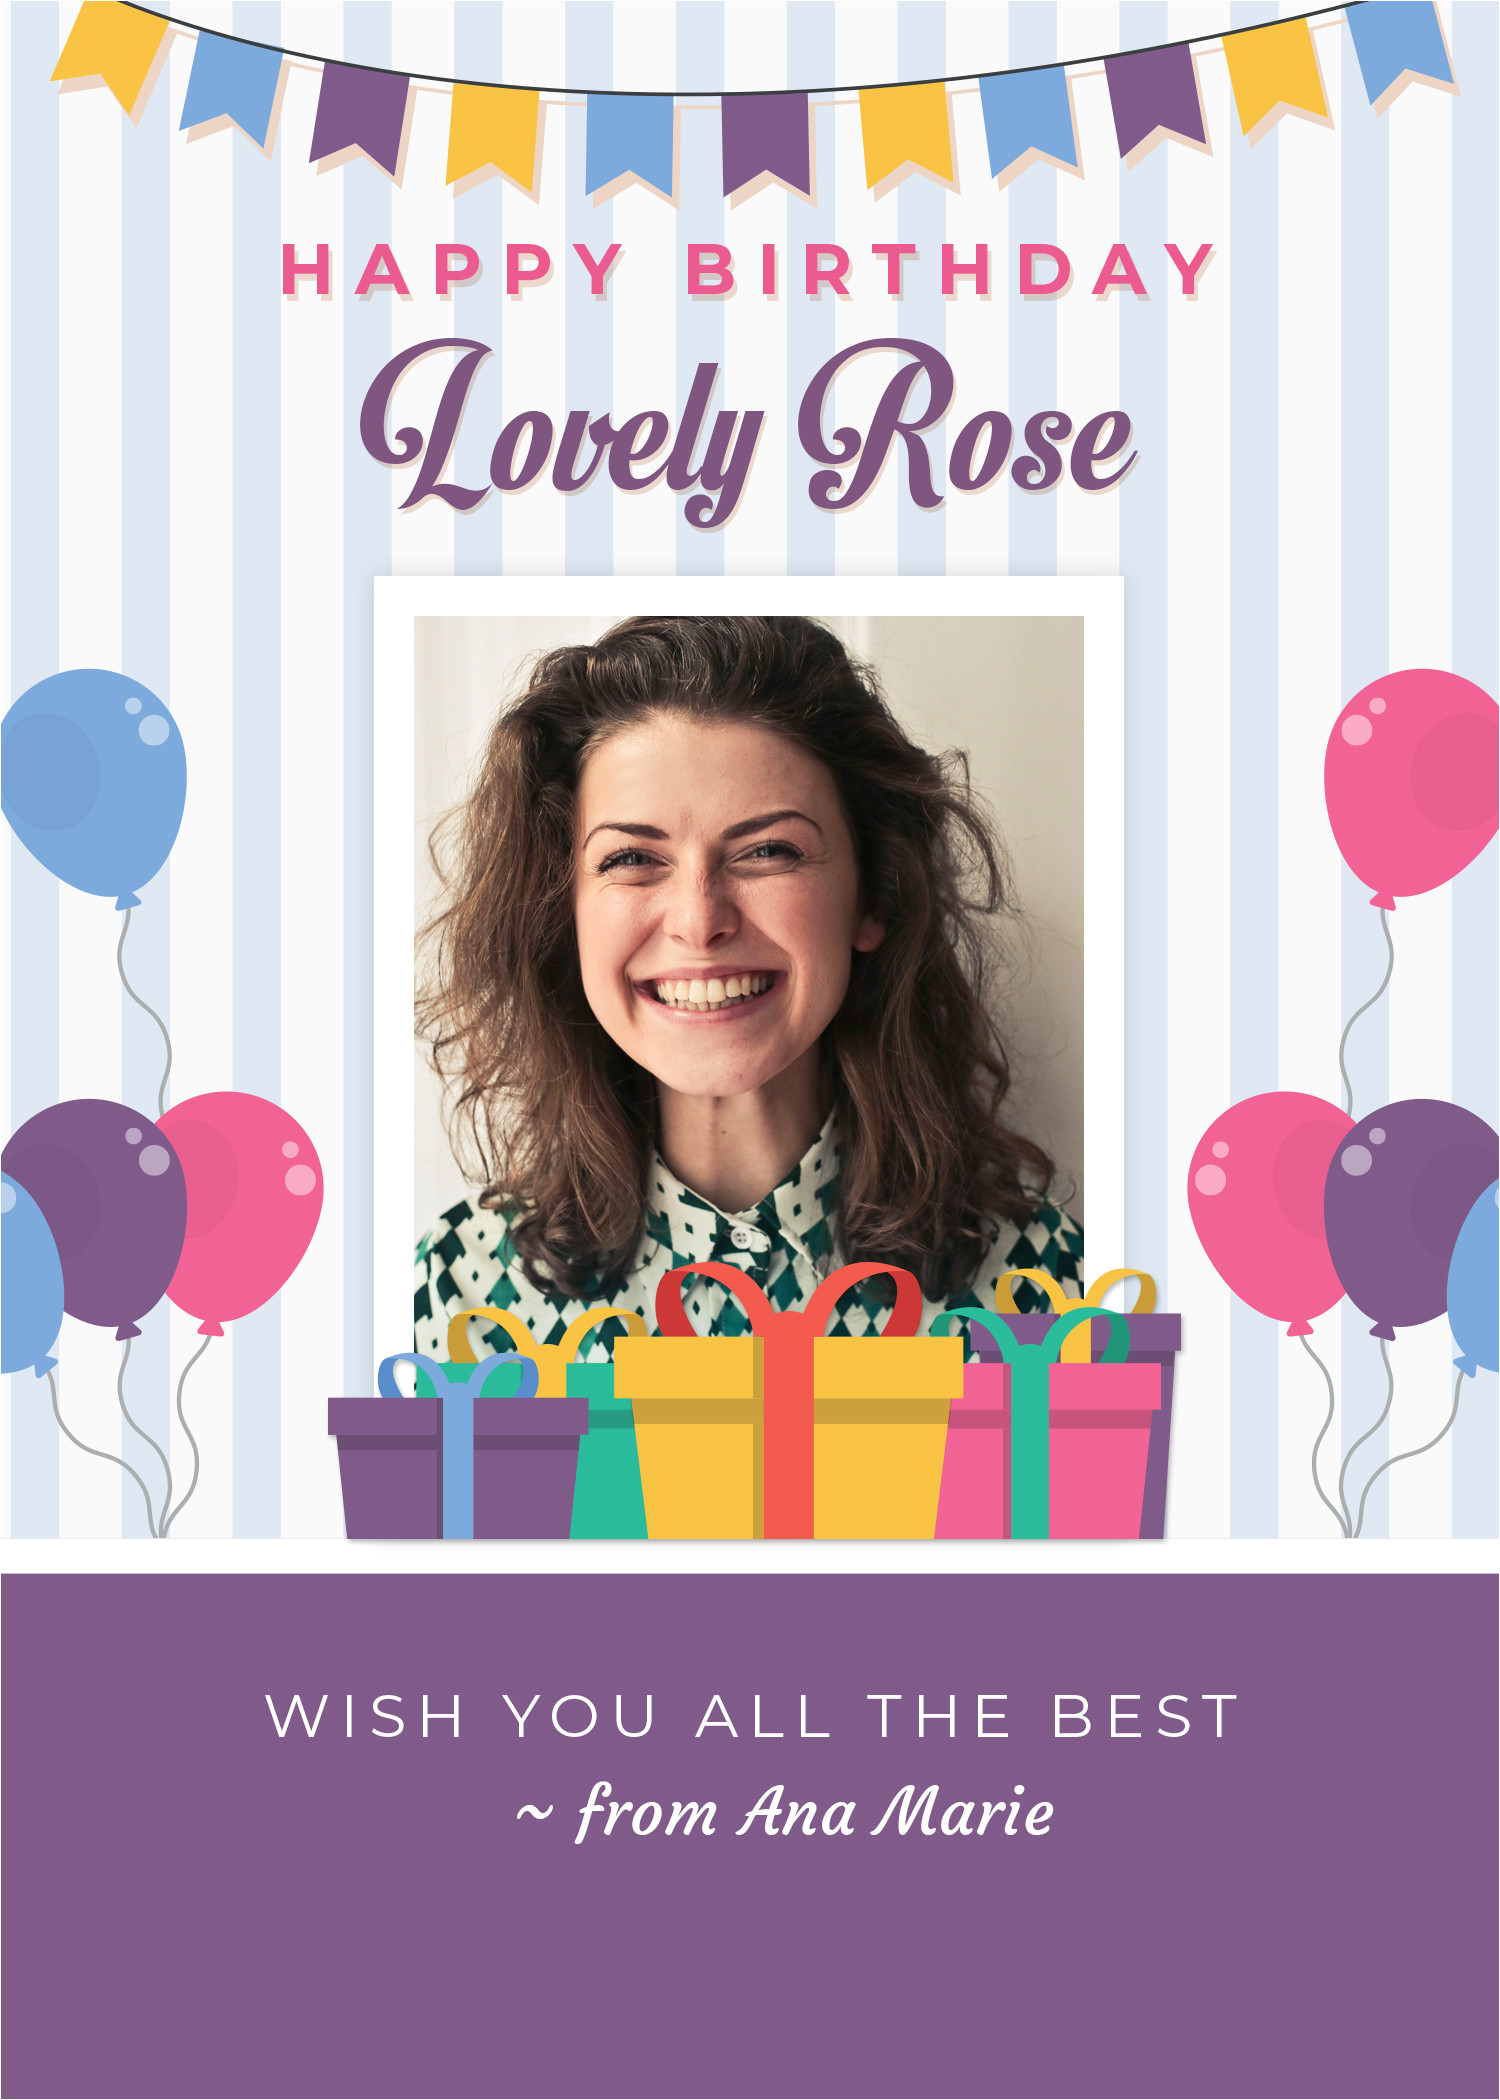 Birthday Card Design with Photo Birthday Greeting Card Design 2